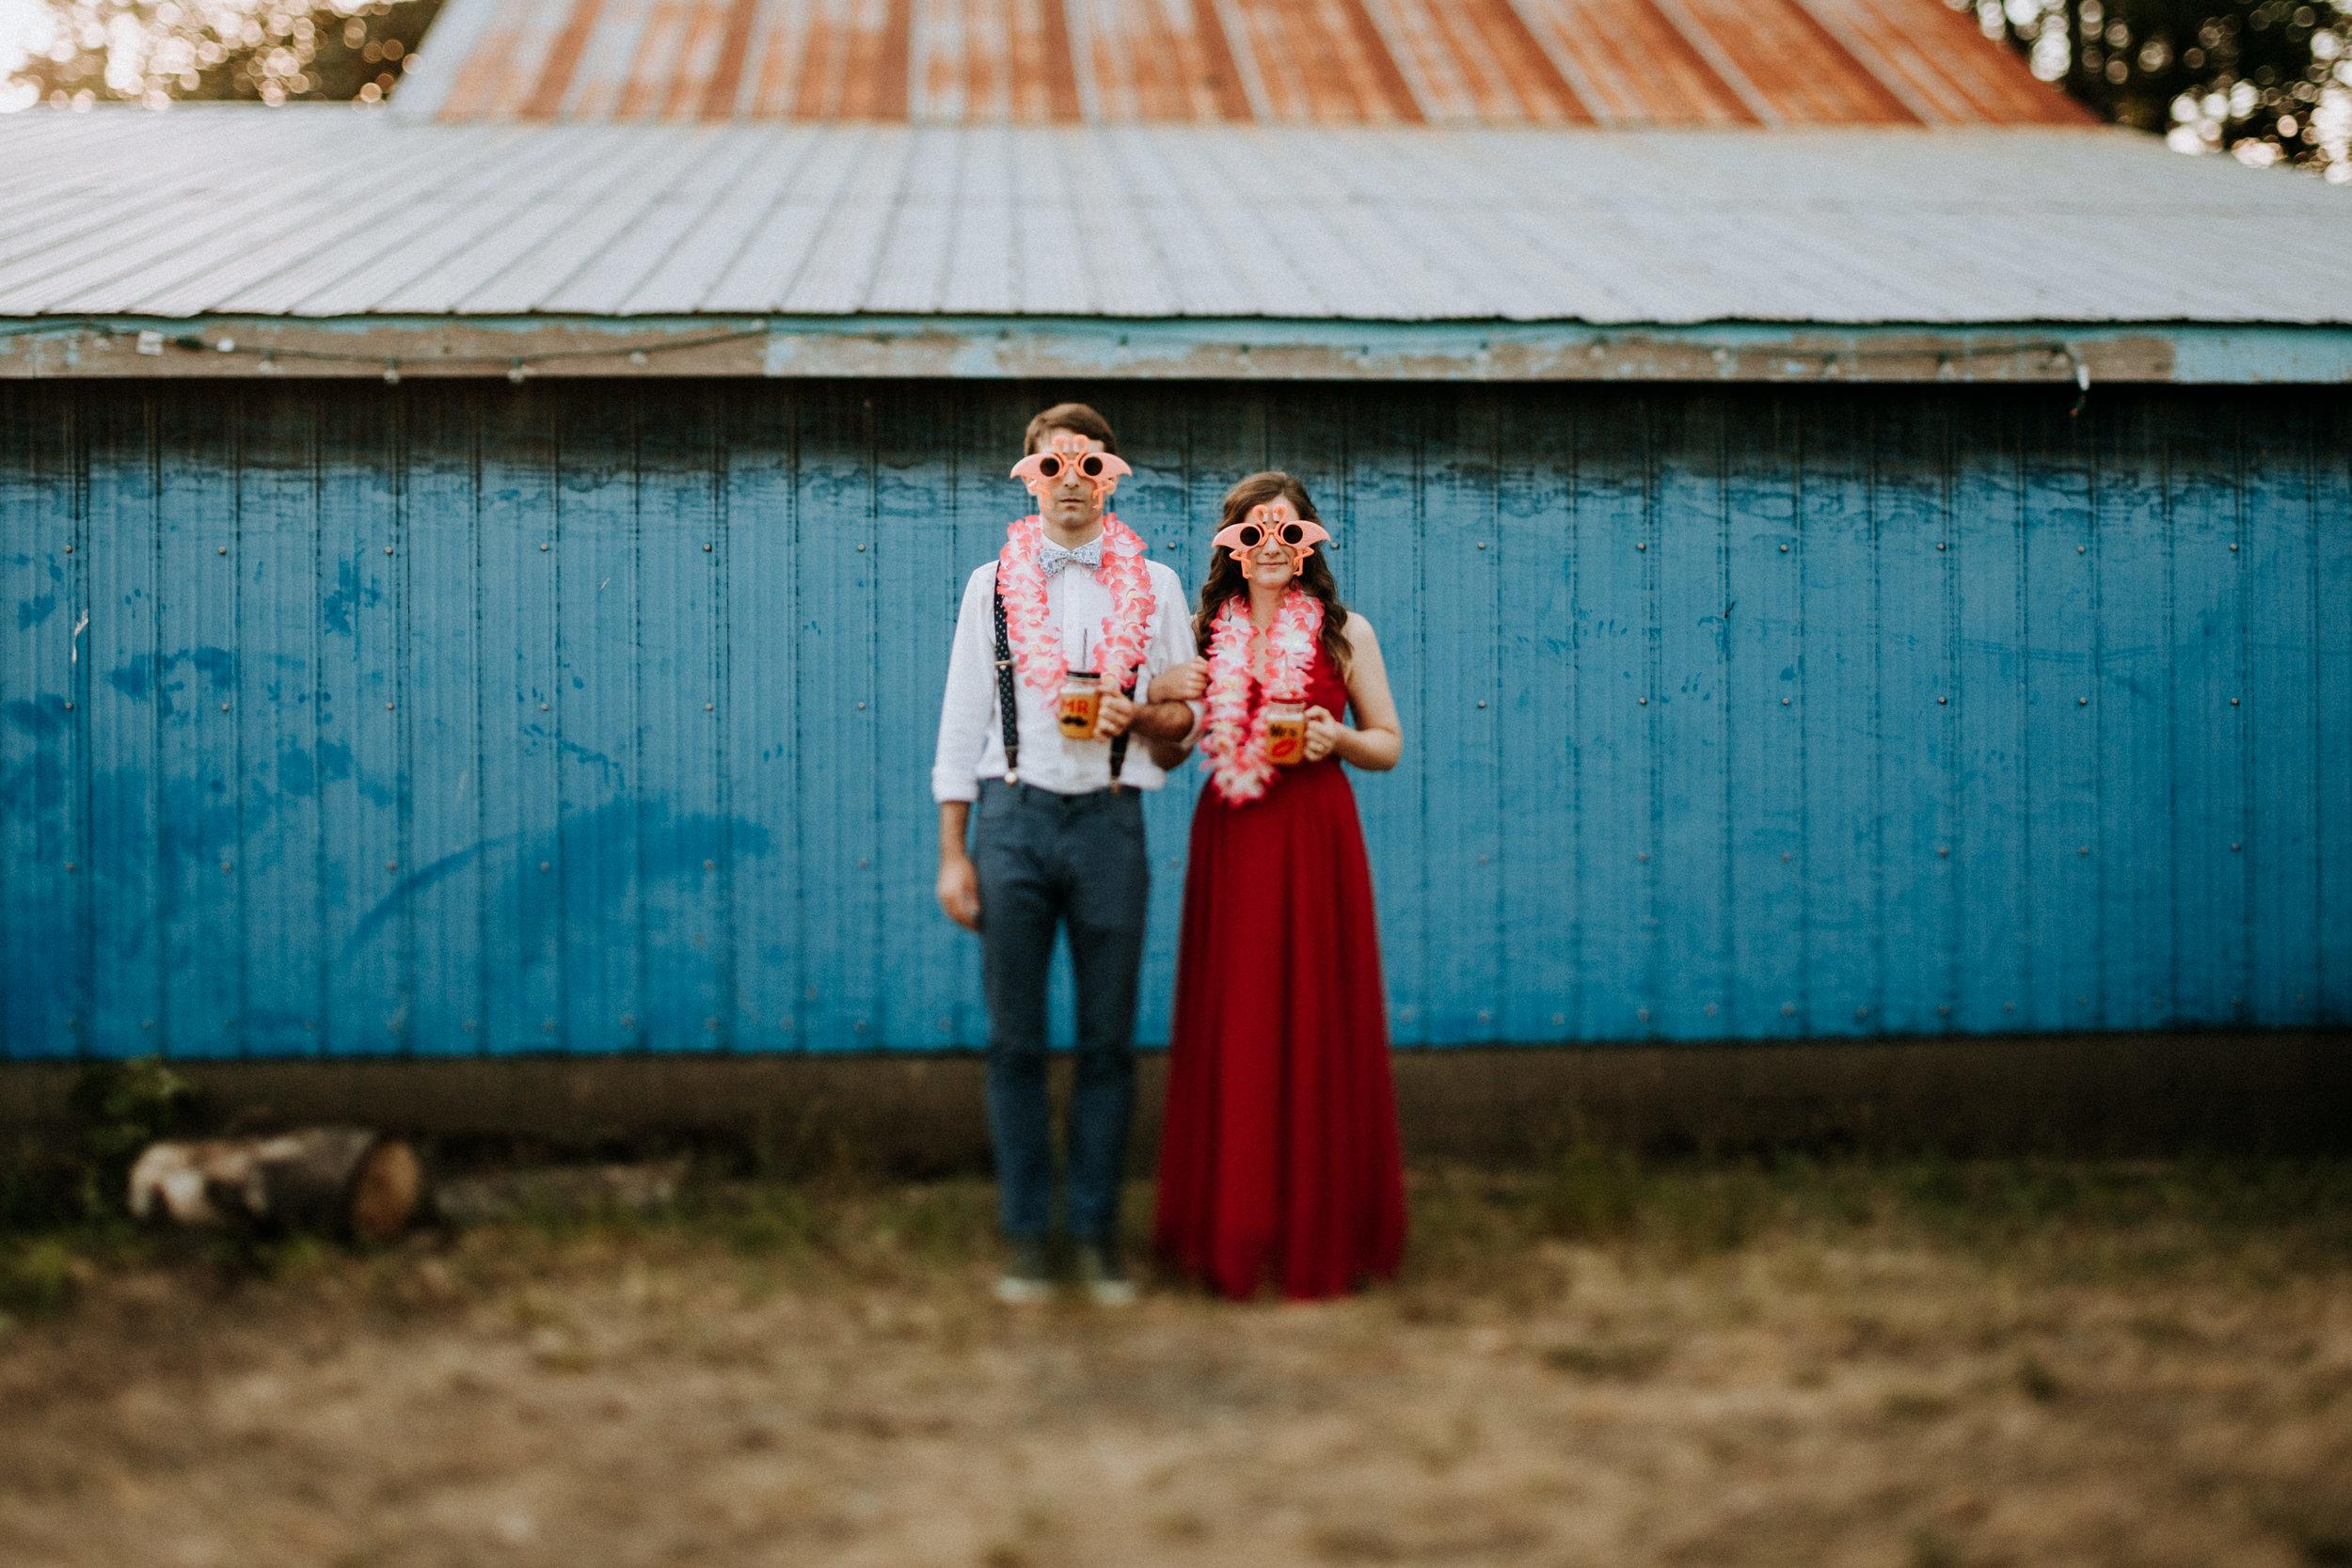 Bride and groom dressed up at farm wedding Courtenay Wedding Photographer